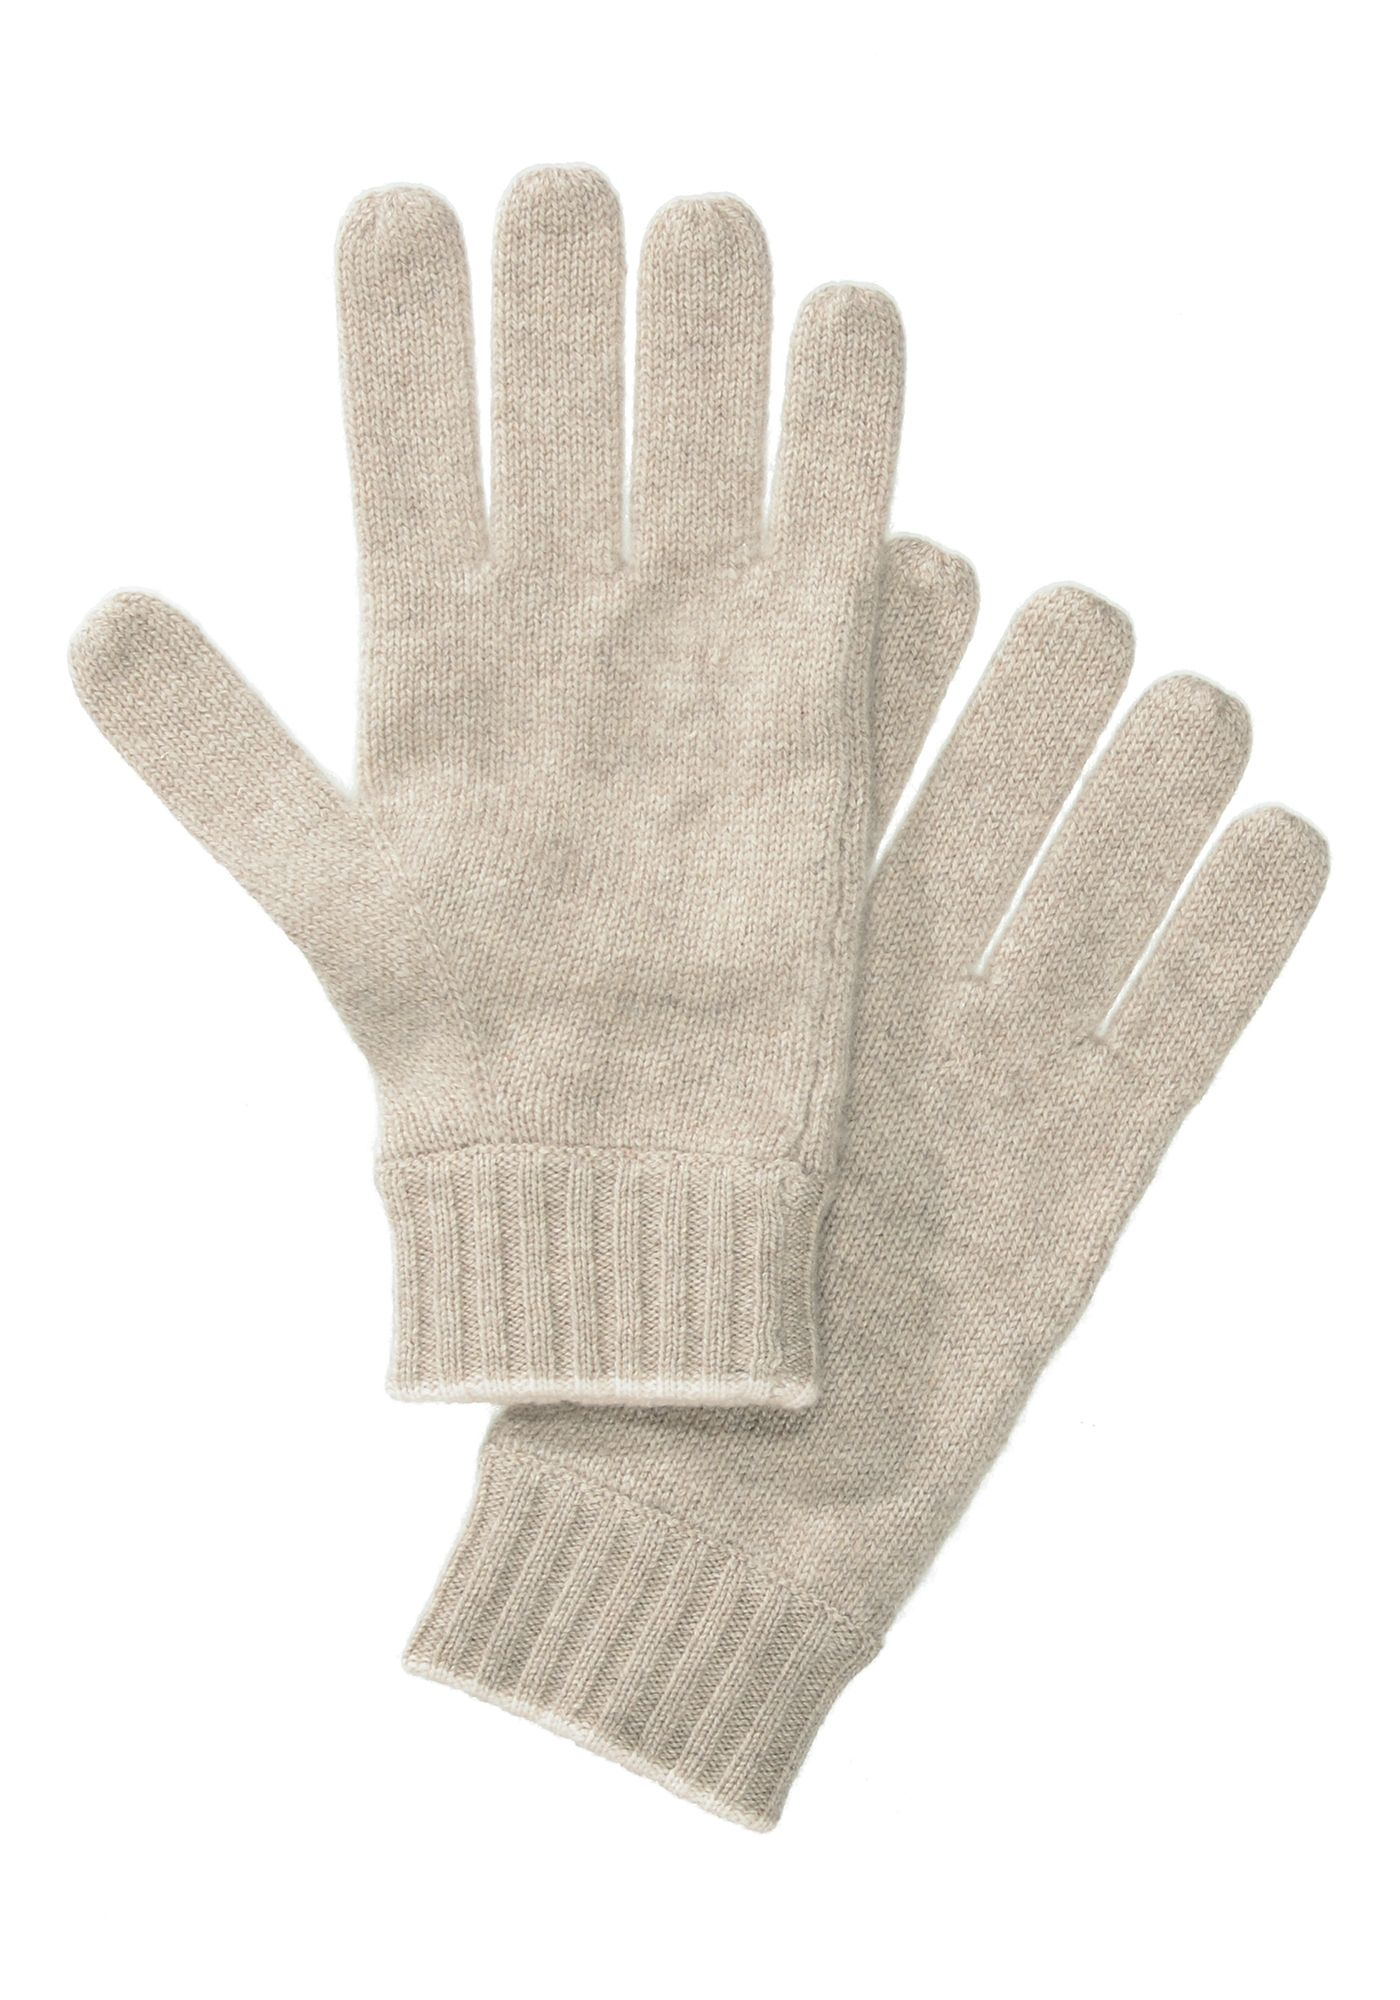 Handschuhe mit Kontrast-Saum